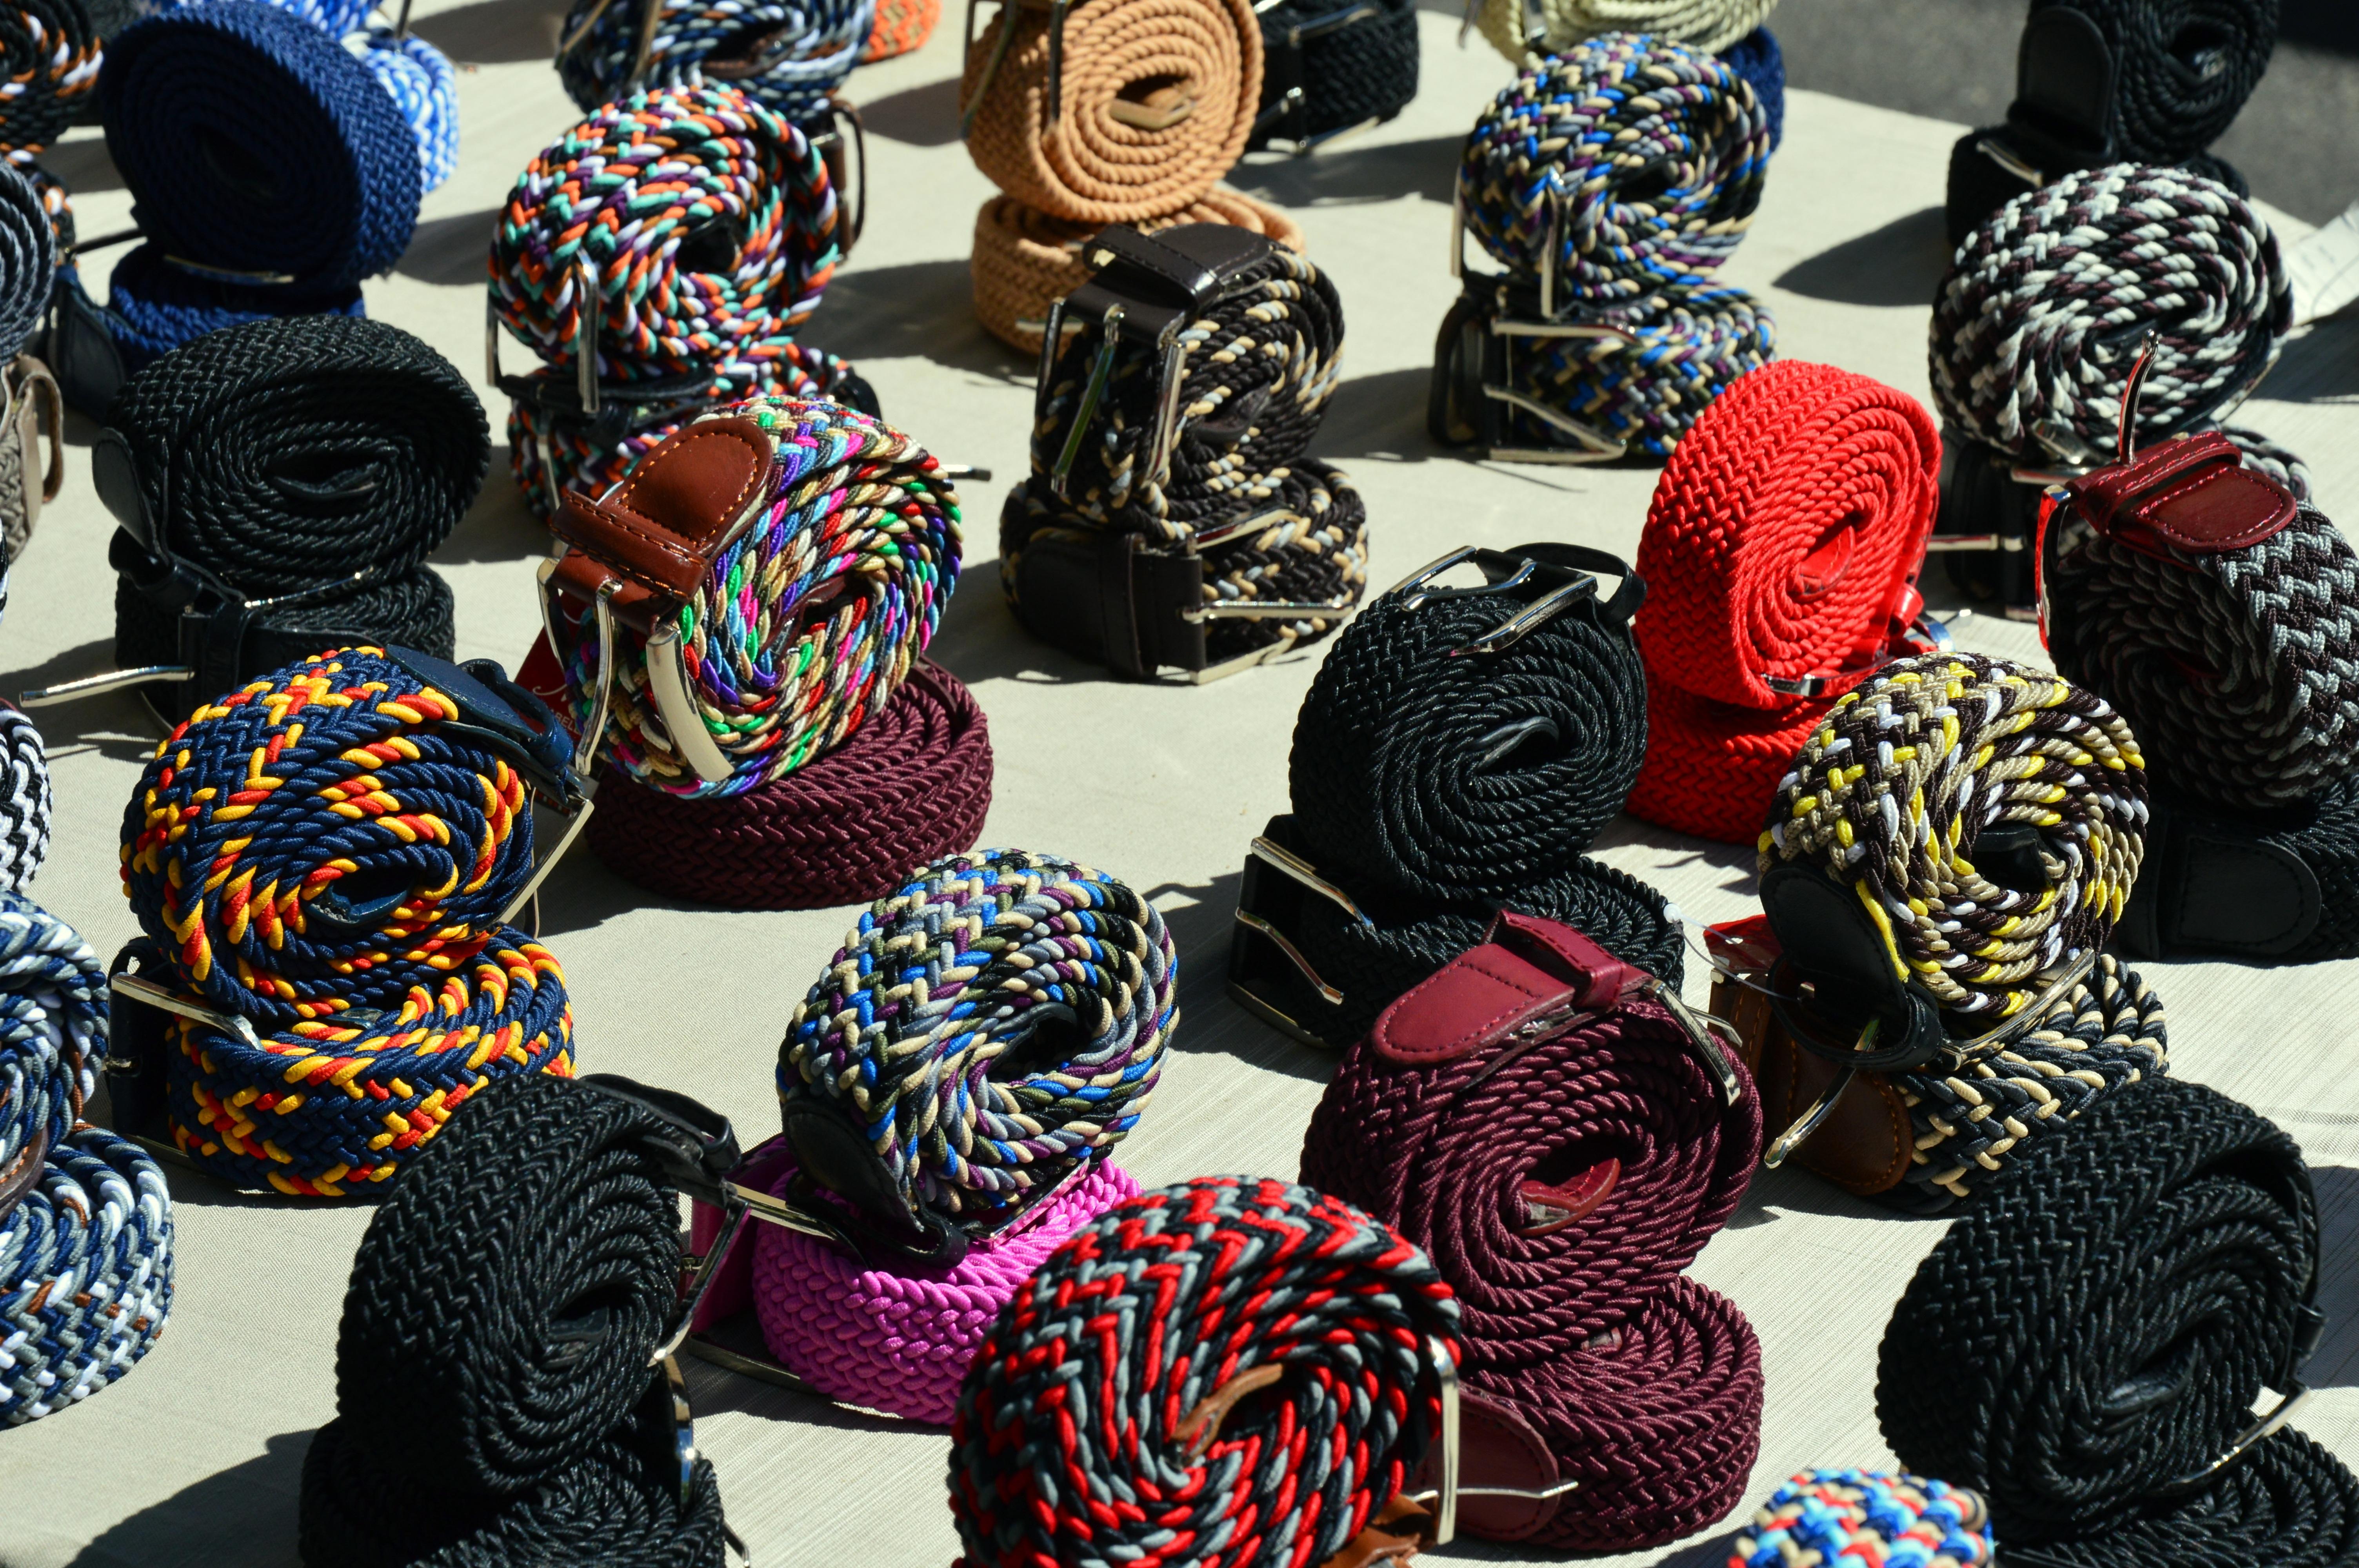 Free Images : pattern, color, hat, market, clothing, headgear, art ...